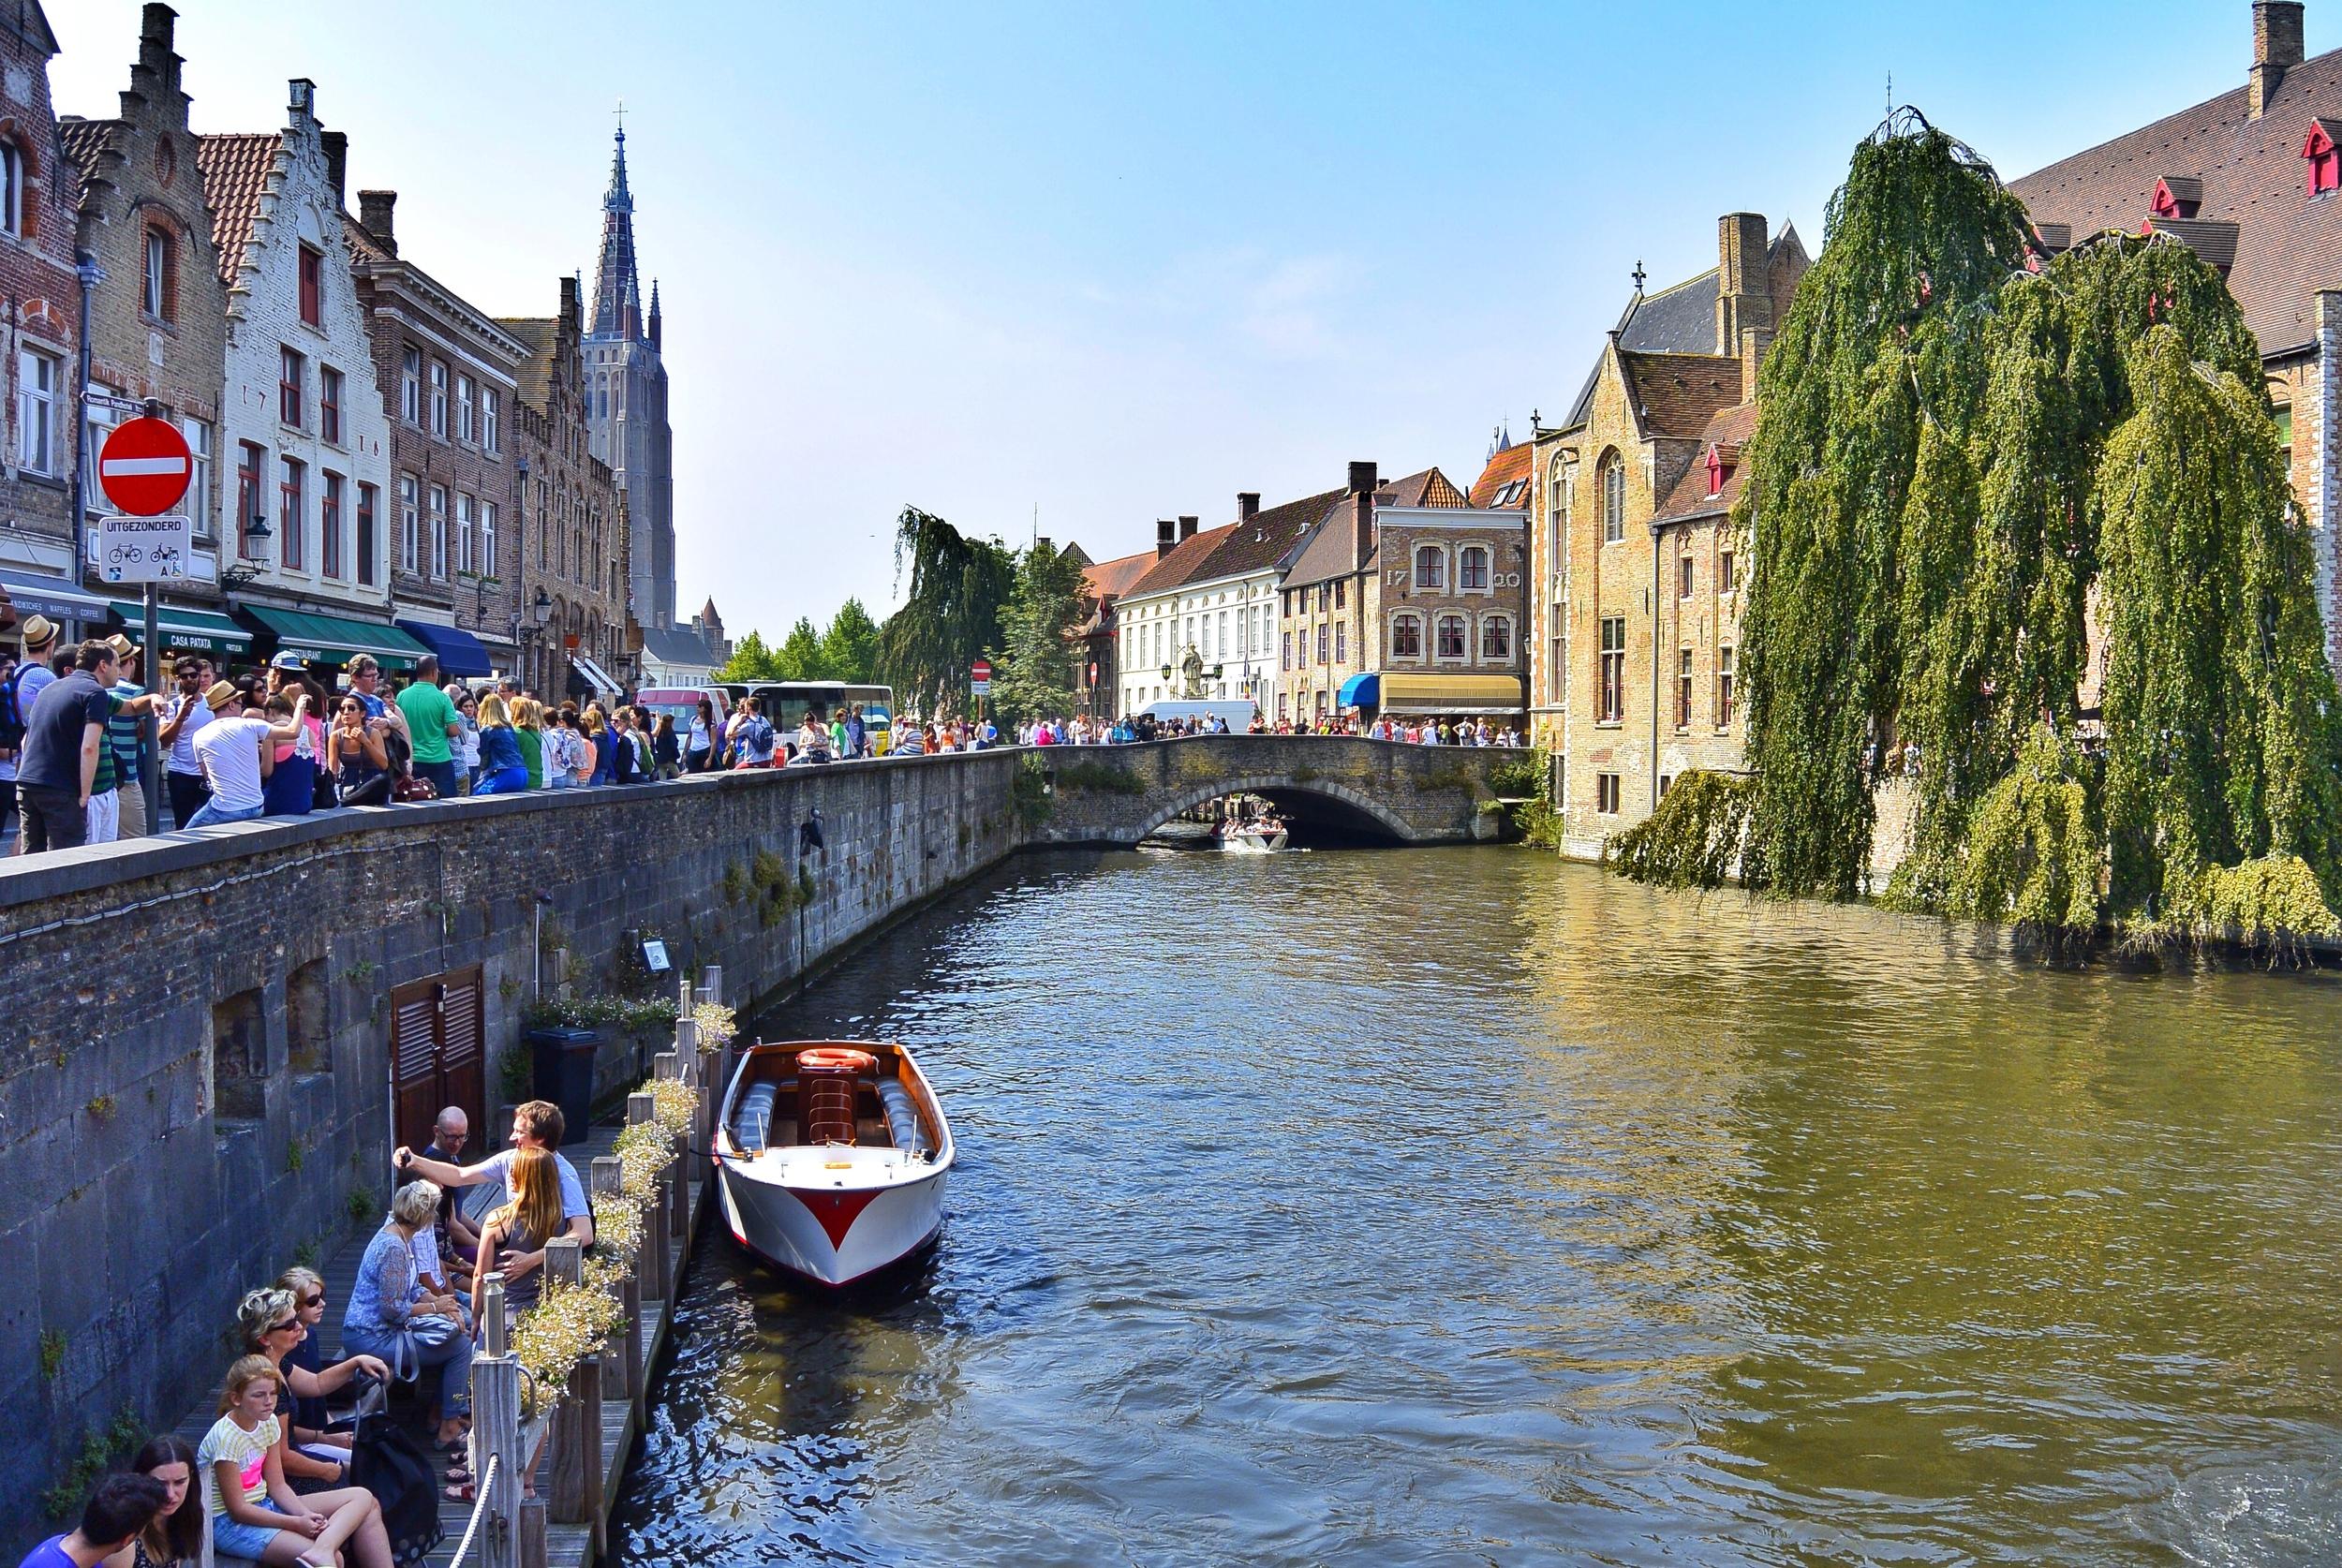 The most photographed spot in Bruges: Rozenhoedkaai